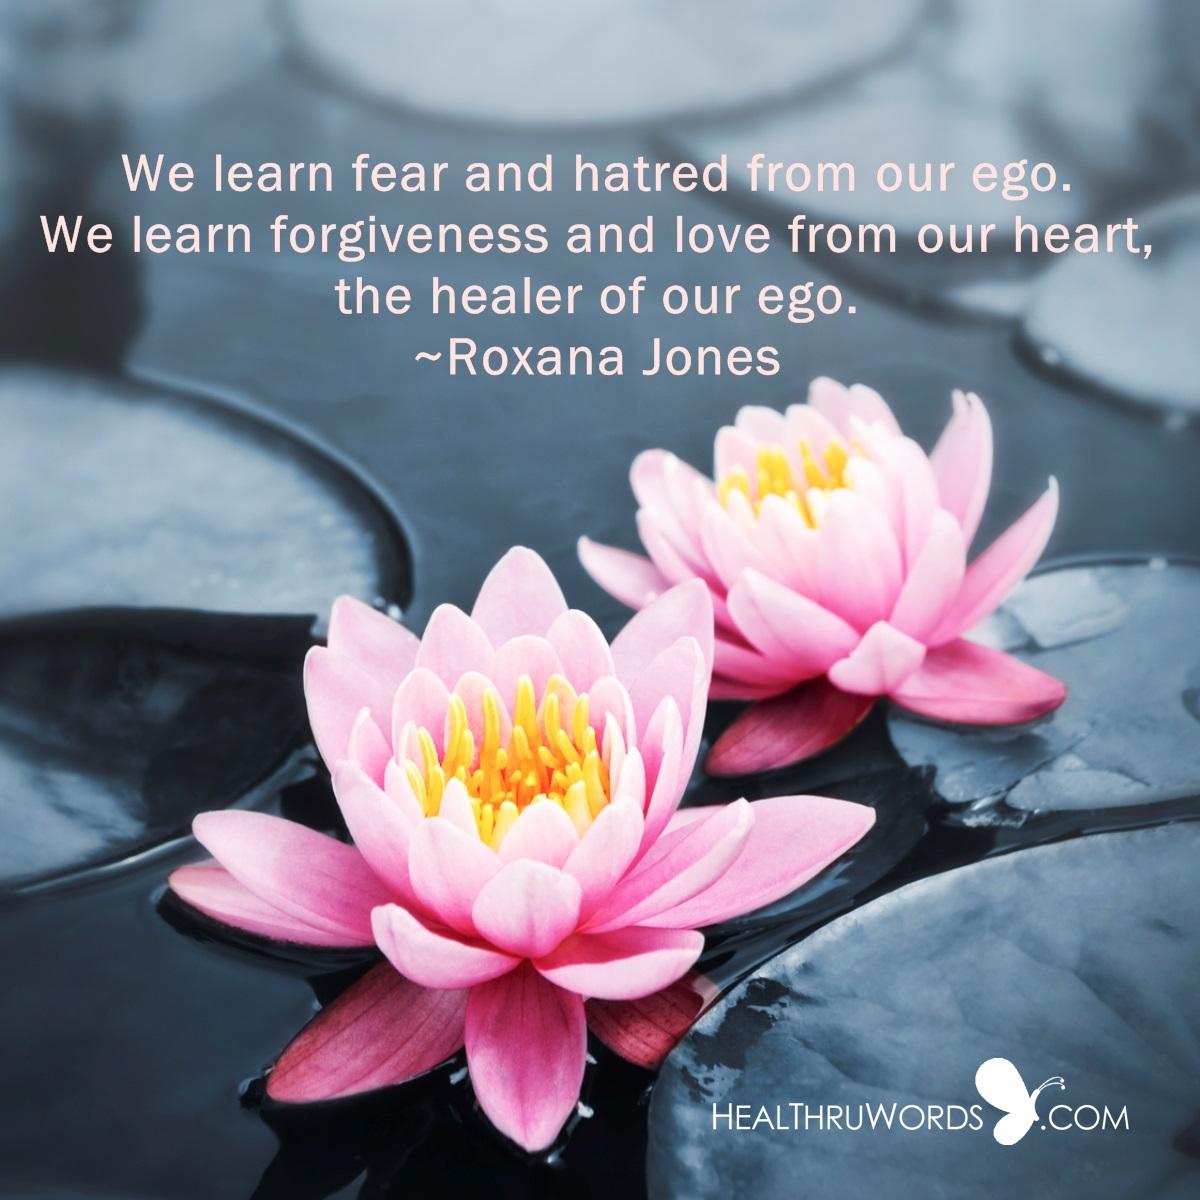 Inspirational And Motivational Quotes Images: Ego Quotes Spiritual. QuotesGram